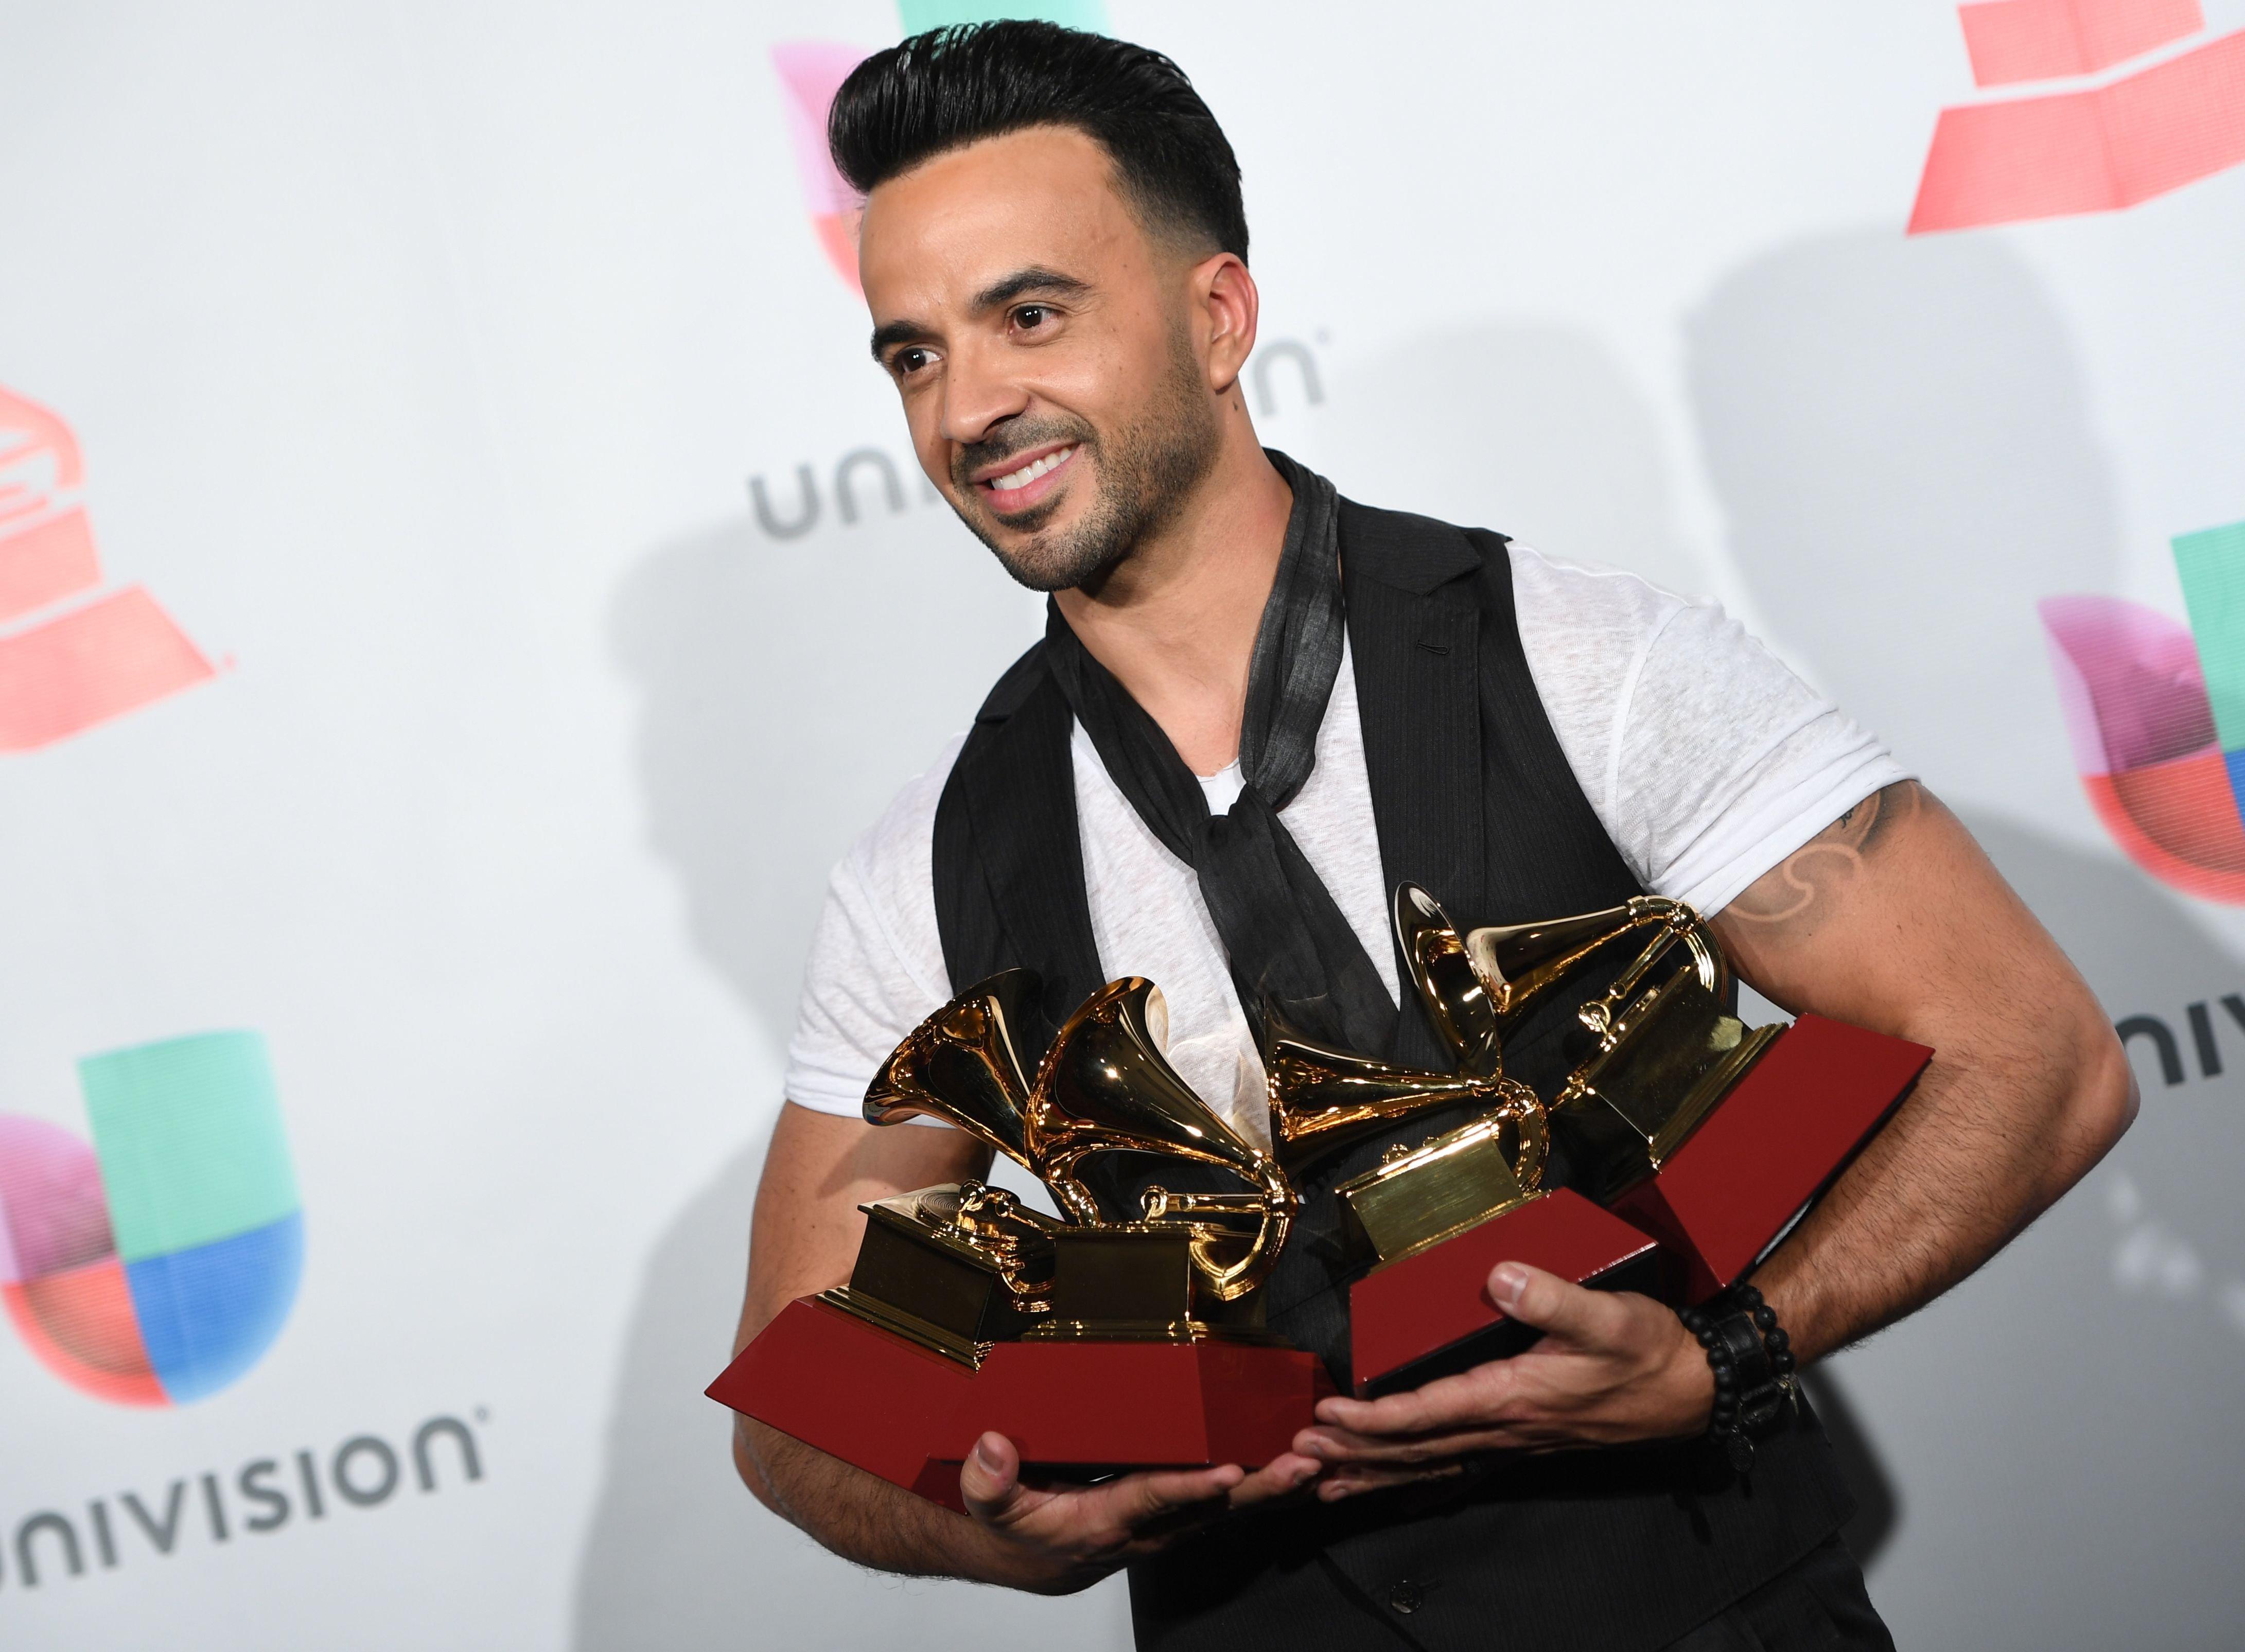 Grammys: It's A 'Despacito' Night At The Latin Grammys